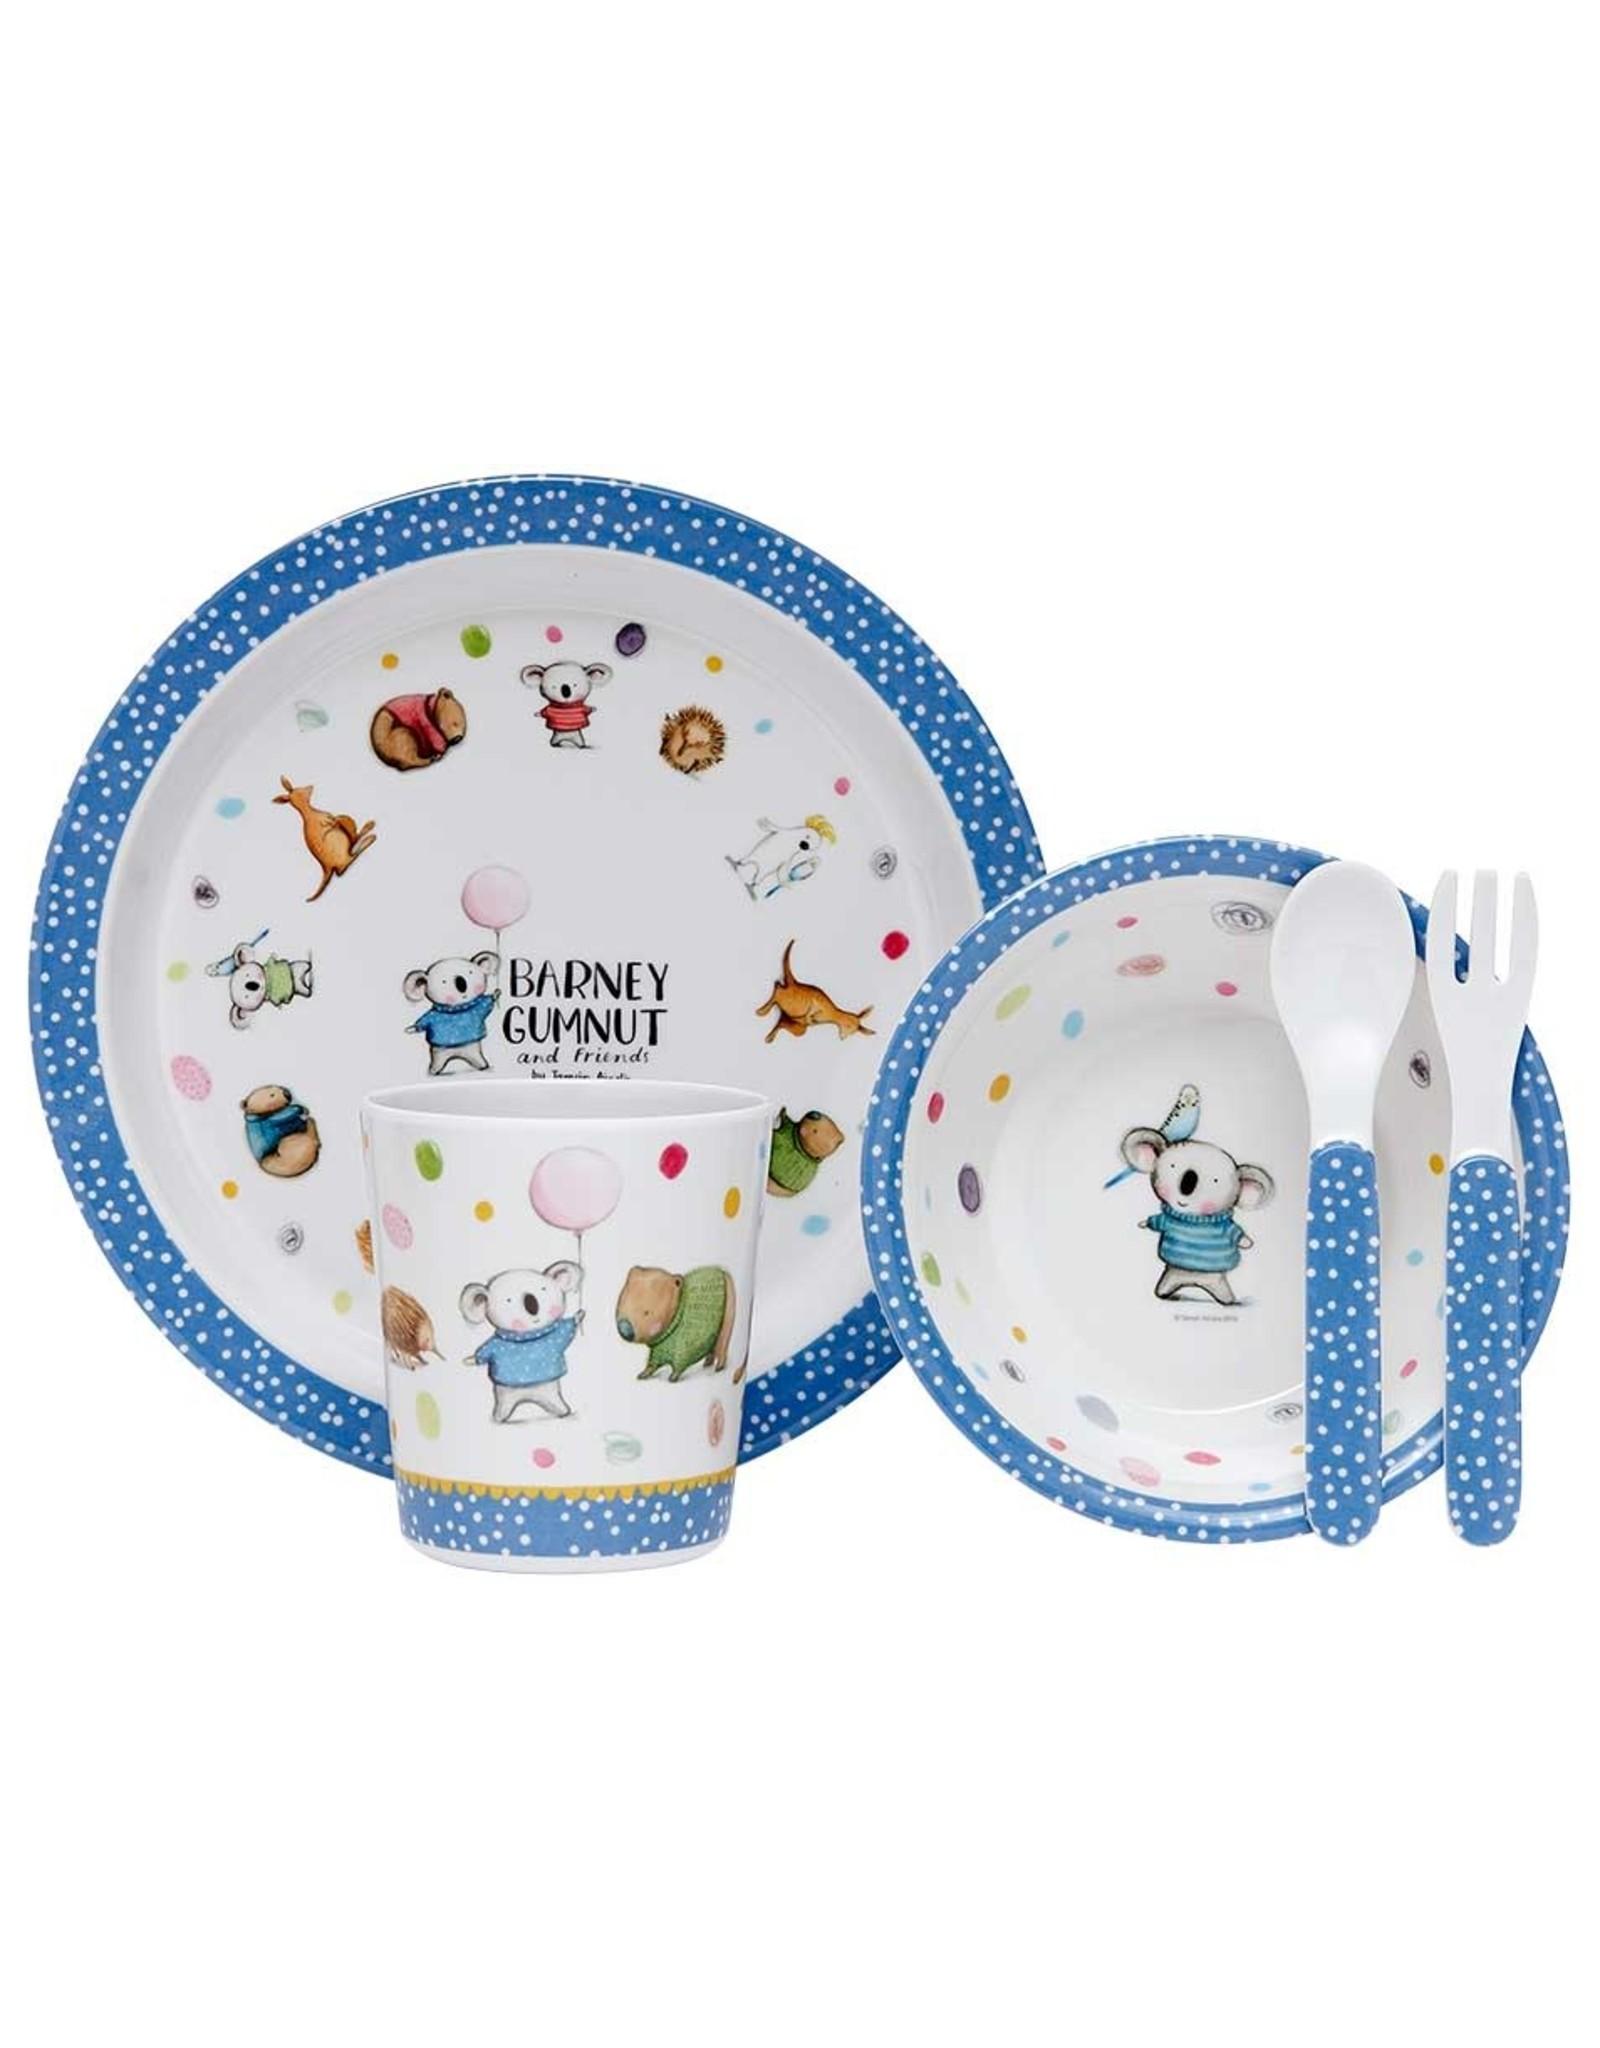 Ashdene Barney Gumnut & Friends 5 Piece Kids Dinner Set